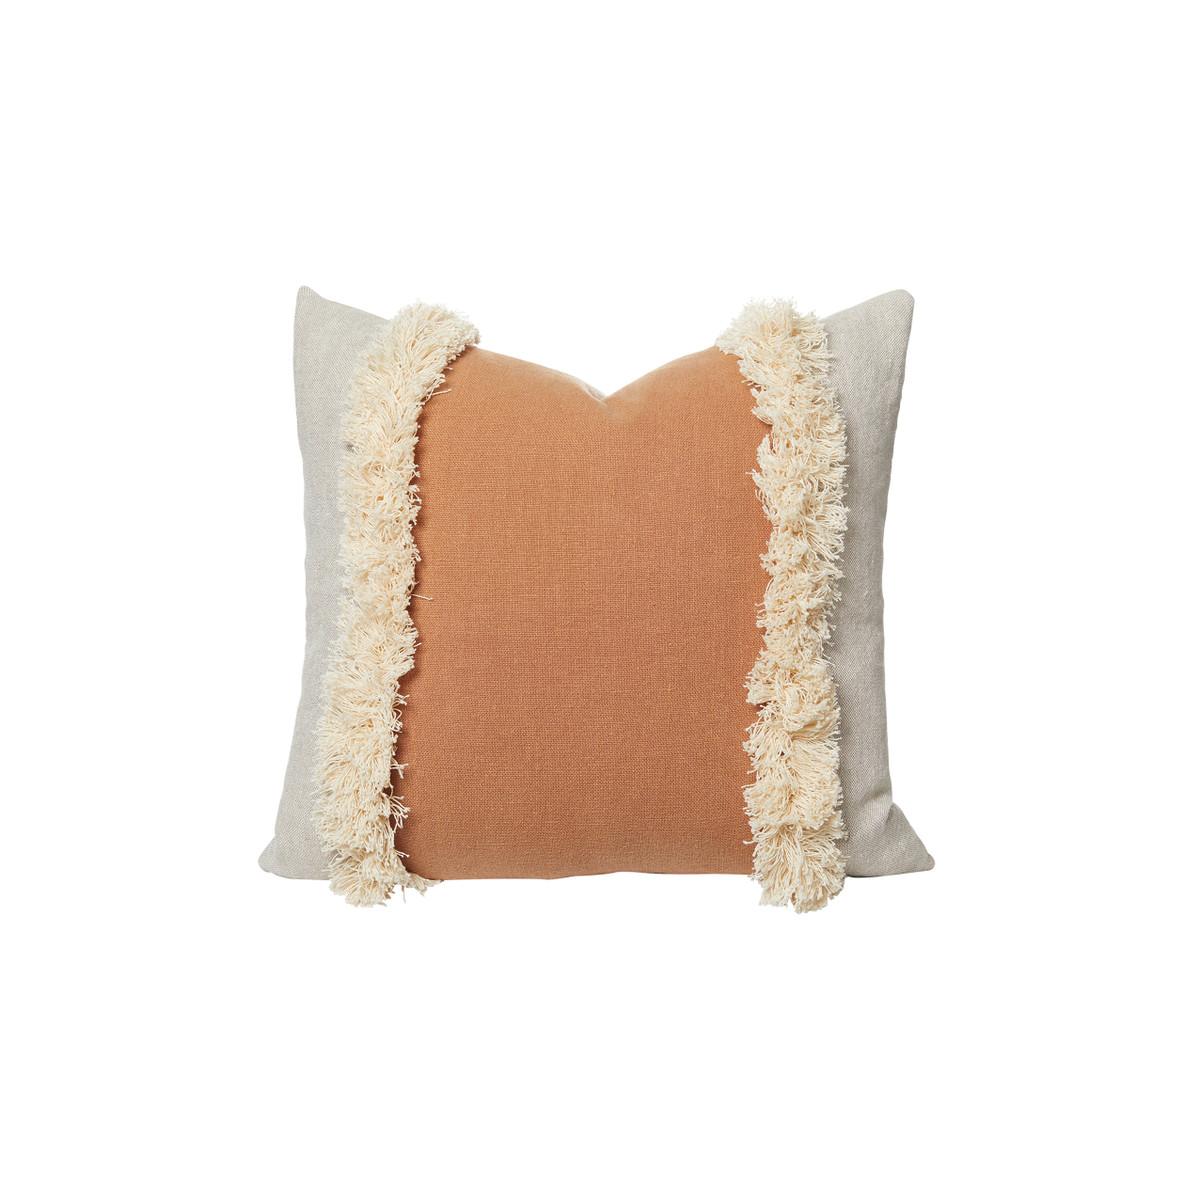 Muse Linen Pillow Sunstone - Front